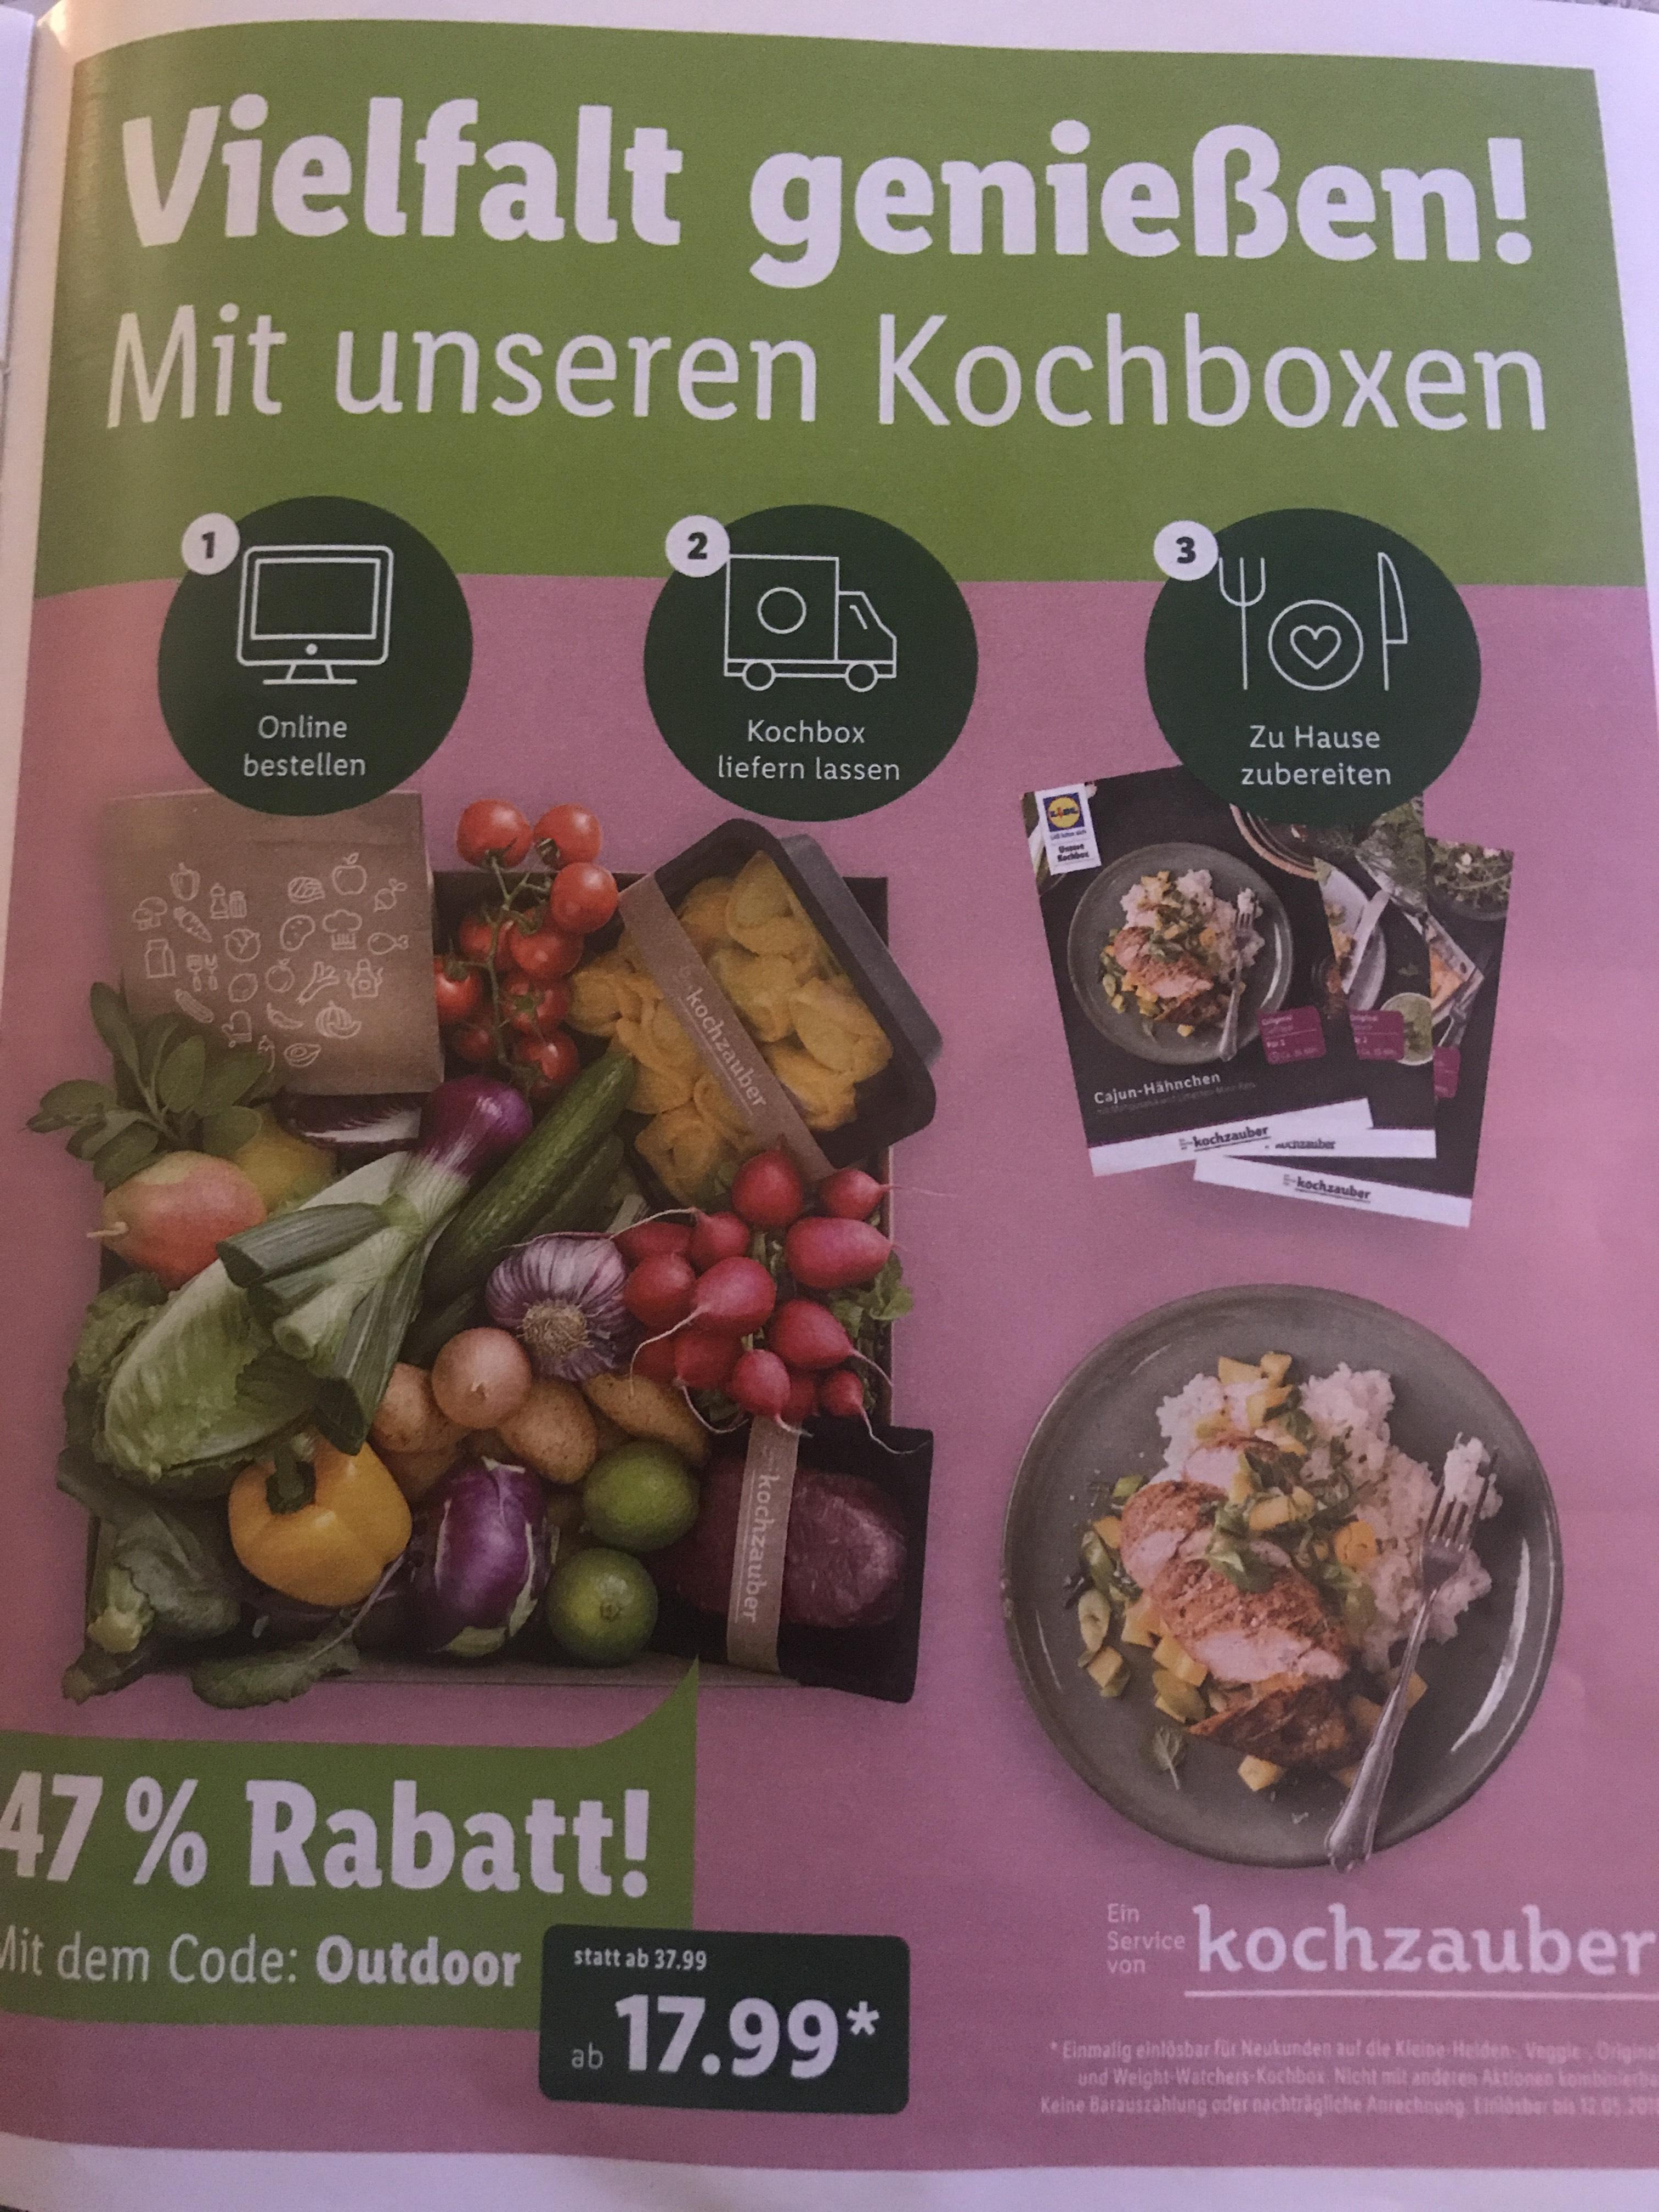 Kochzauber Gutschein Kochbox Lidl